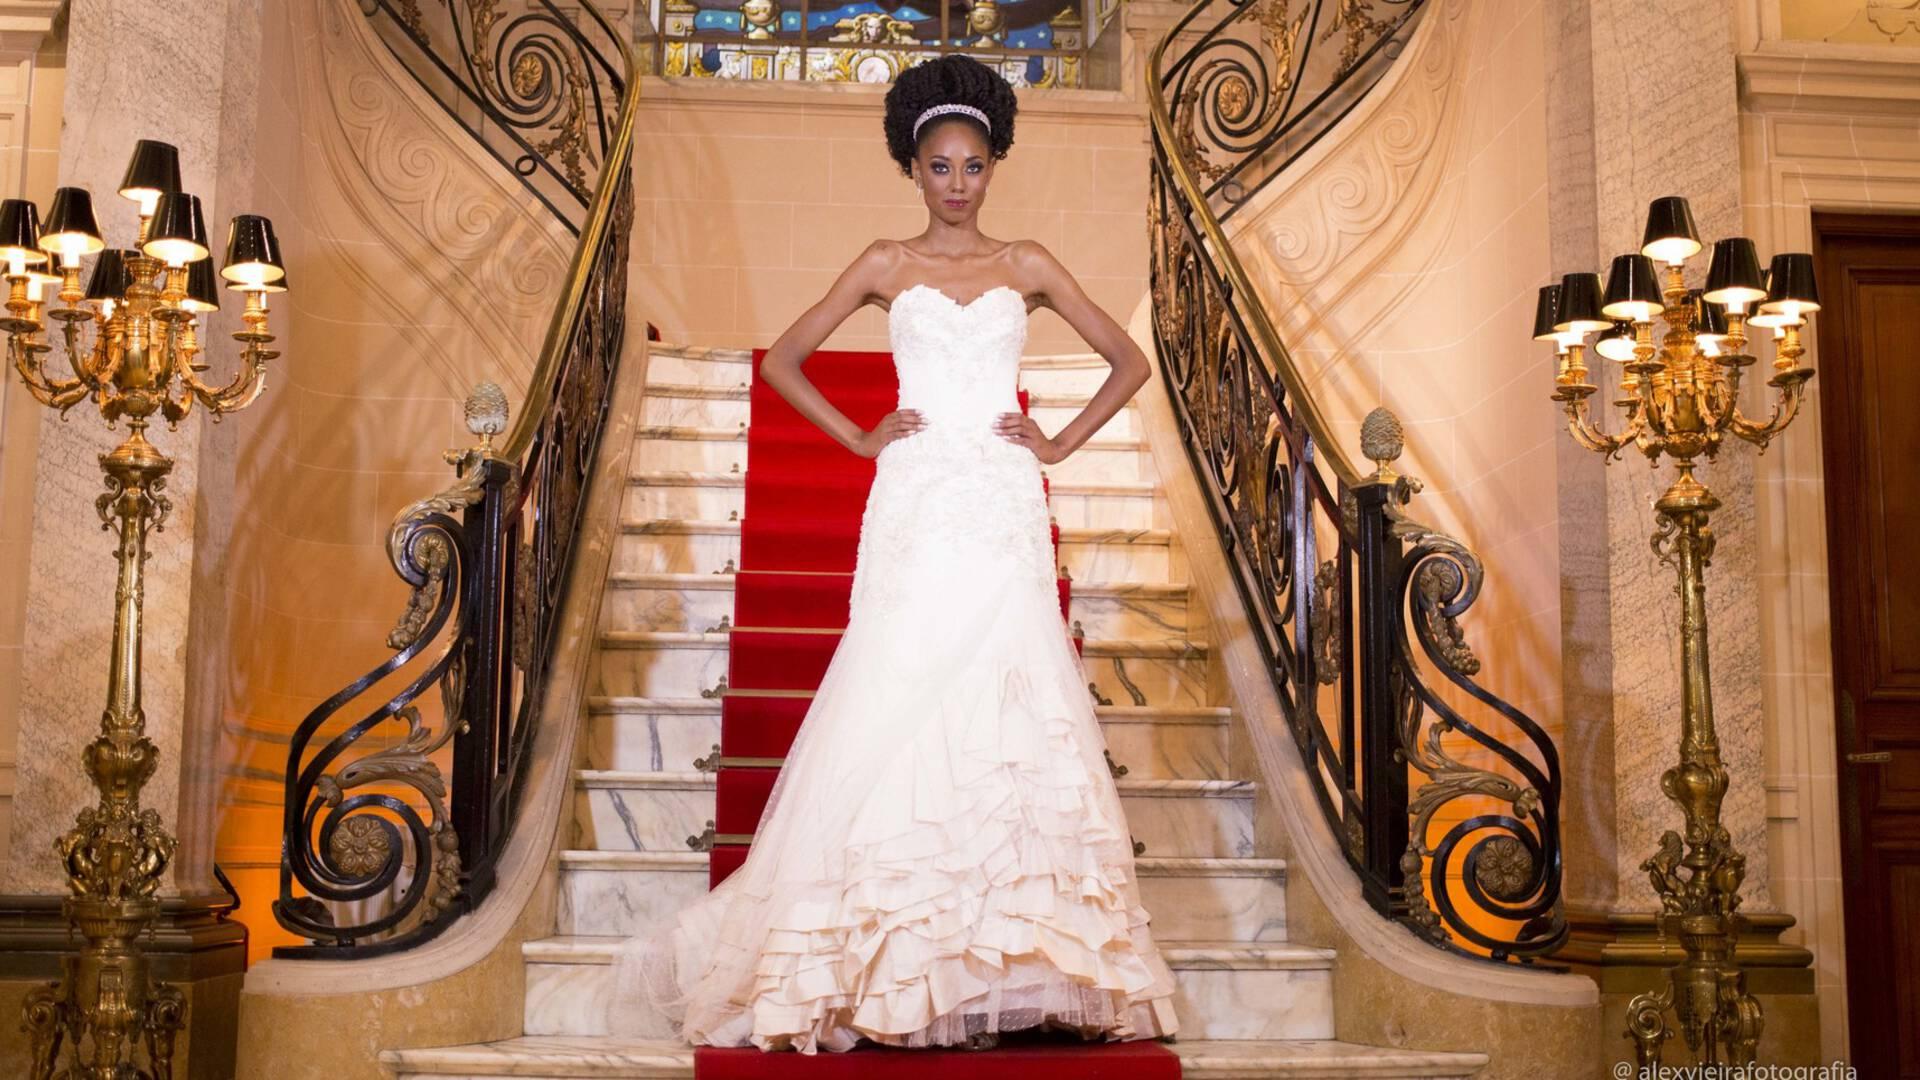 Glamour da Noiva de Entrada Triunfal